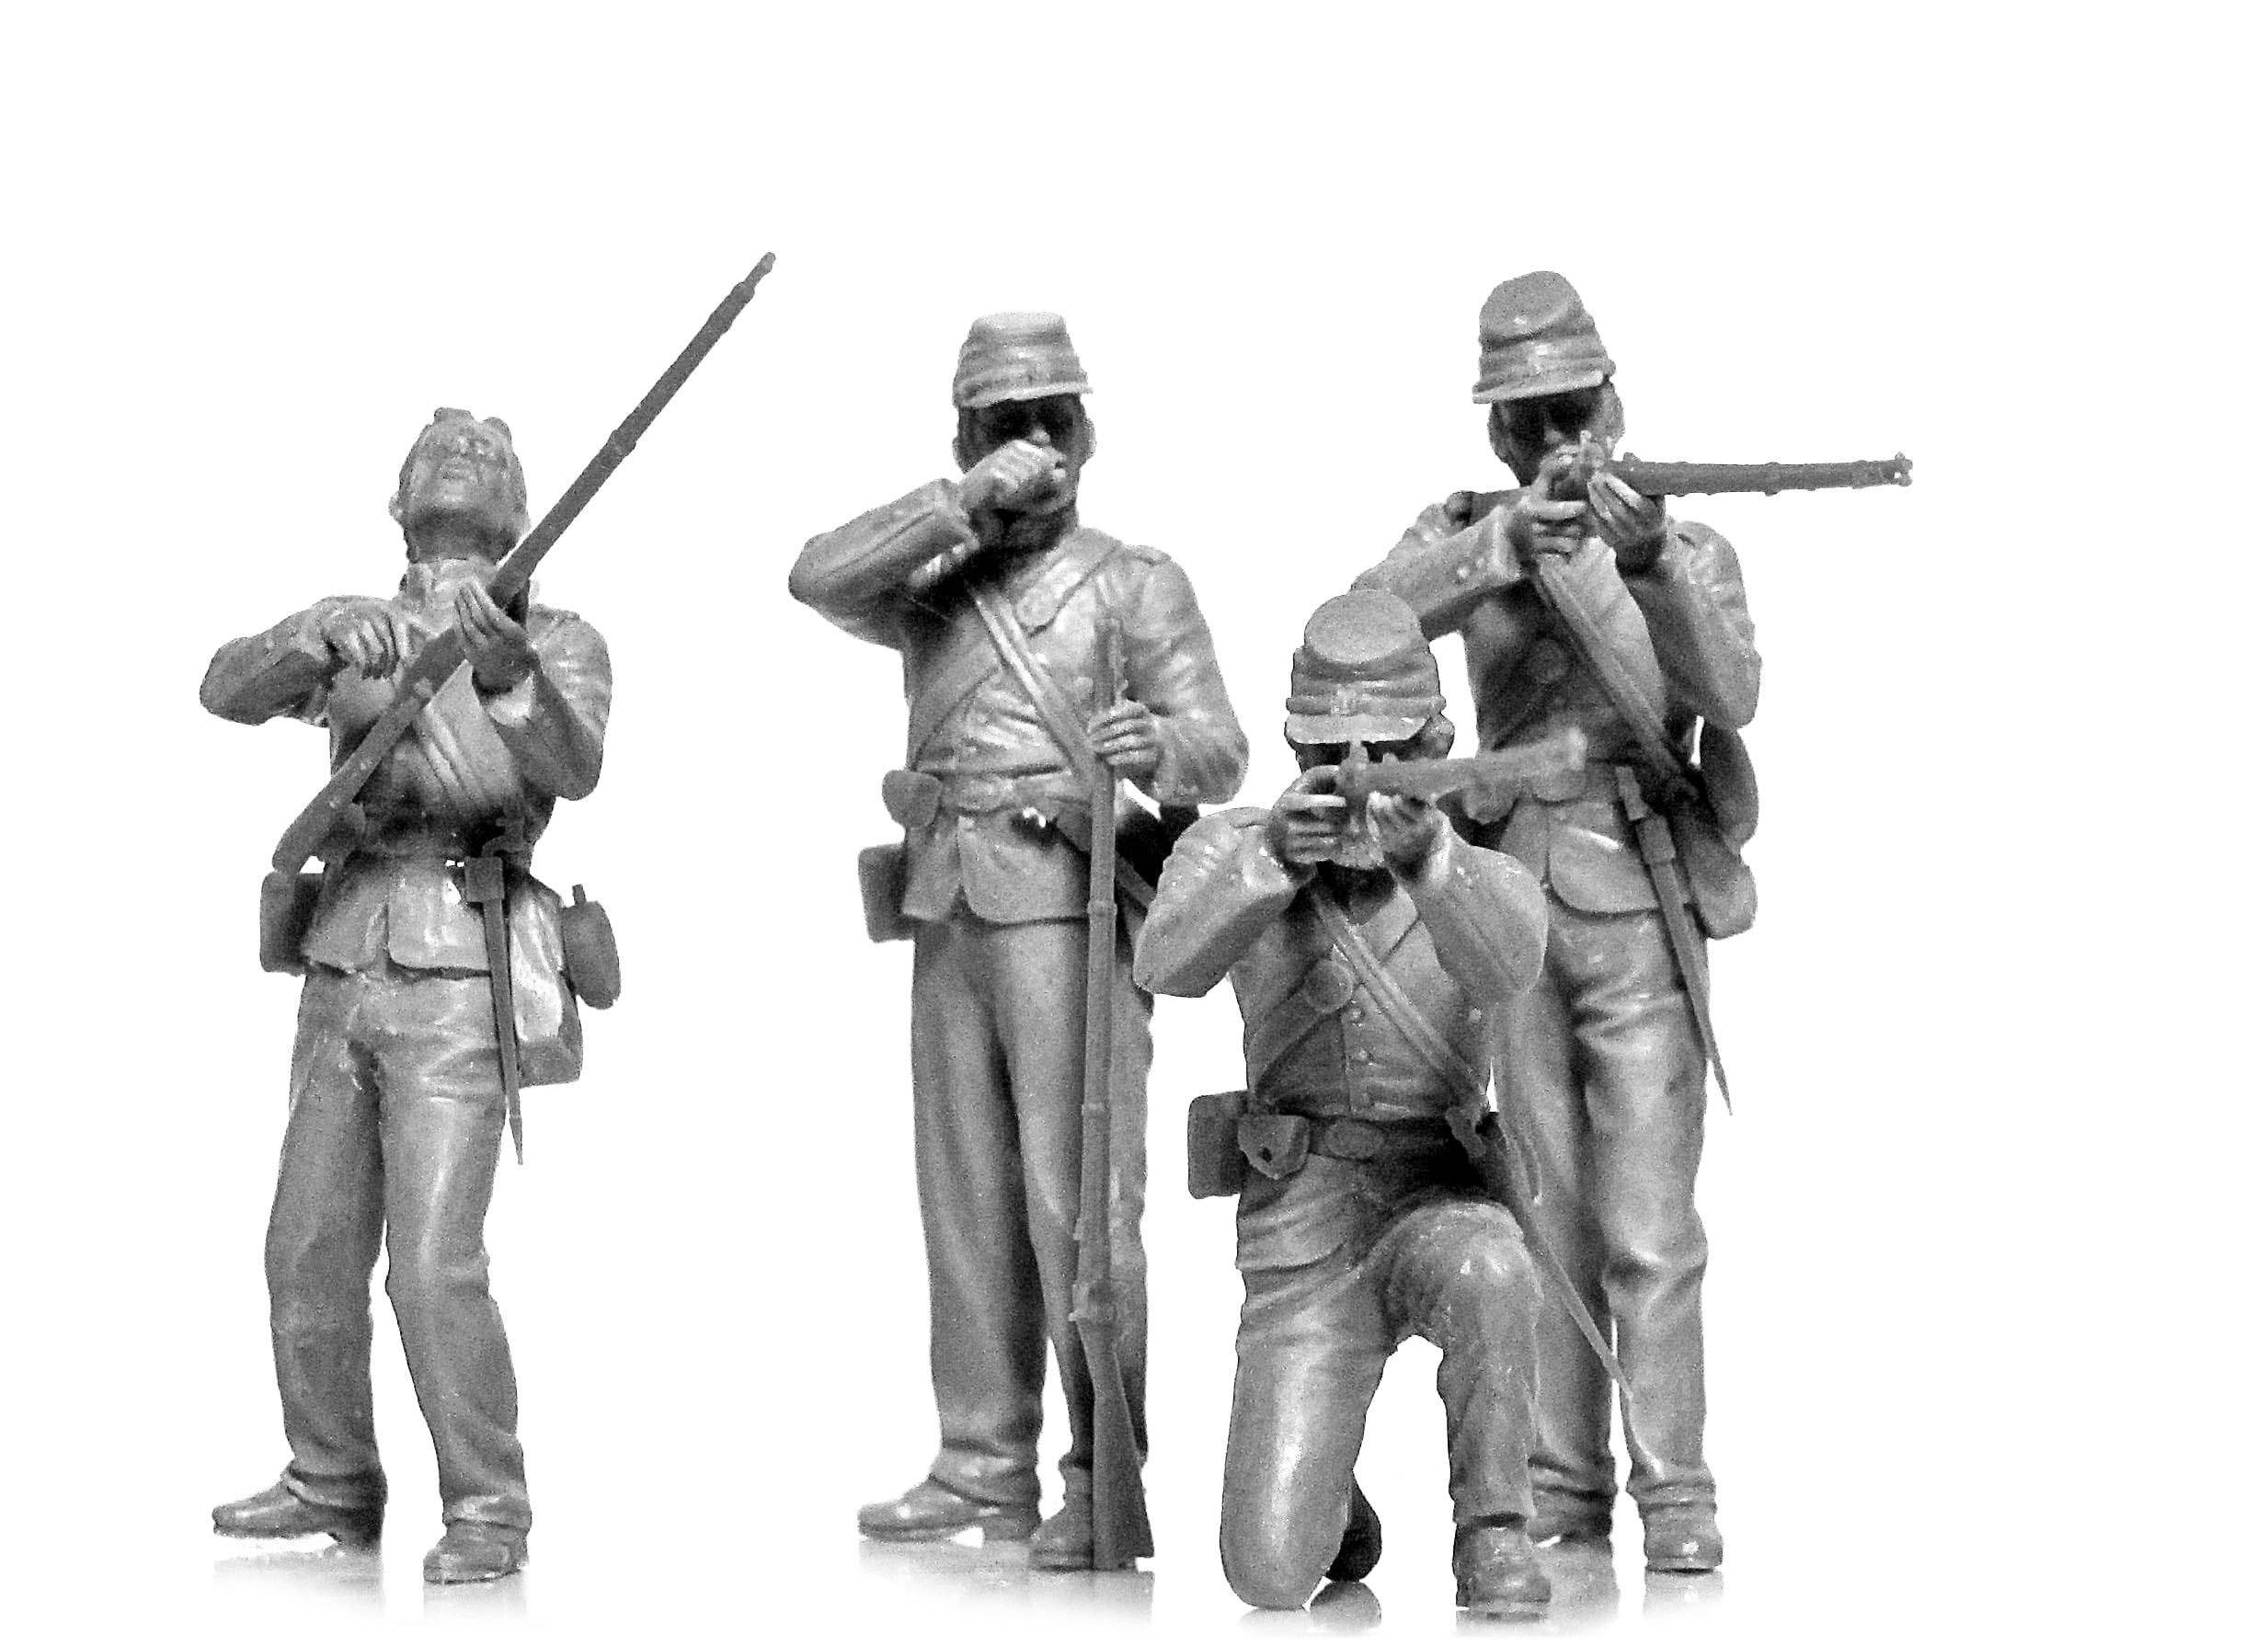 35020 ICM American Civil War Union Infantry 1:35